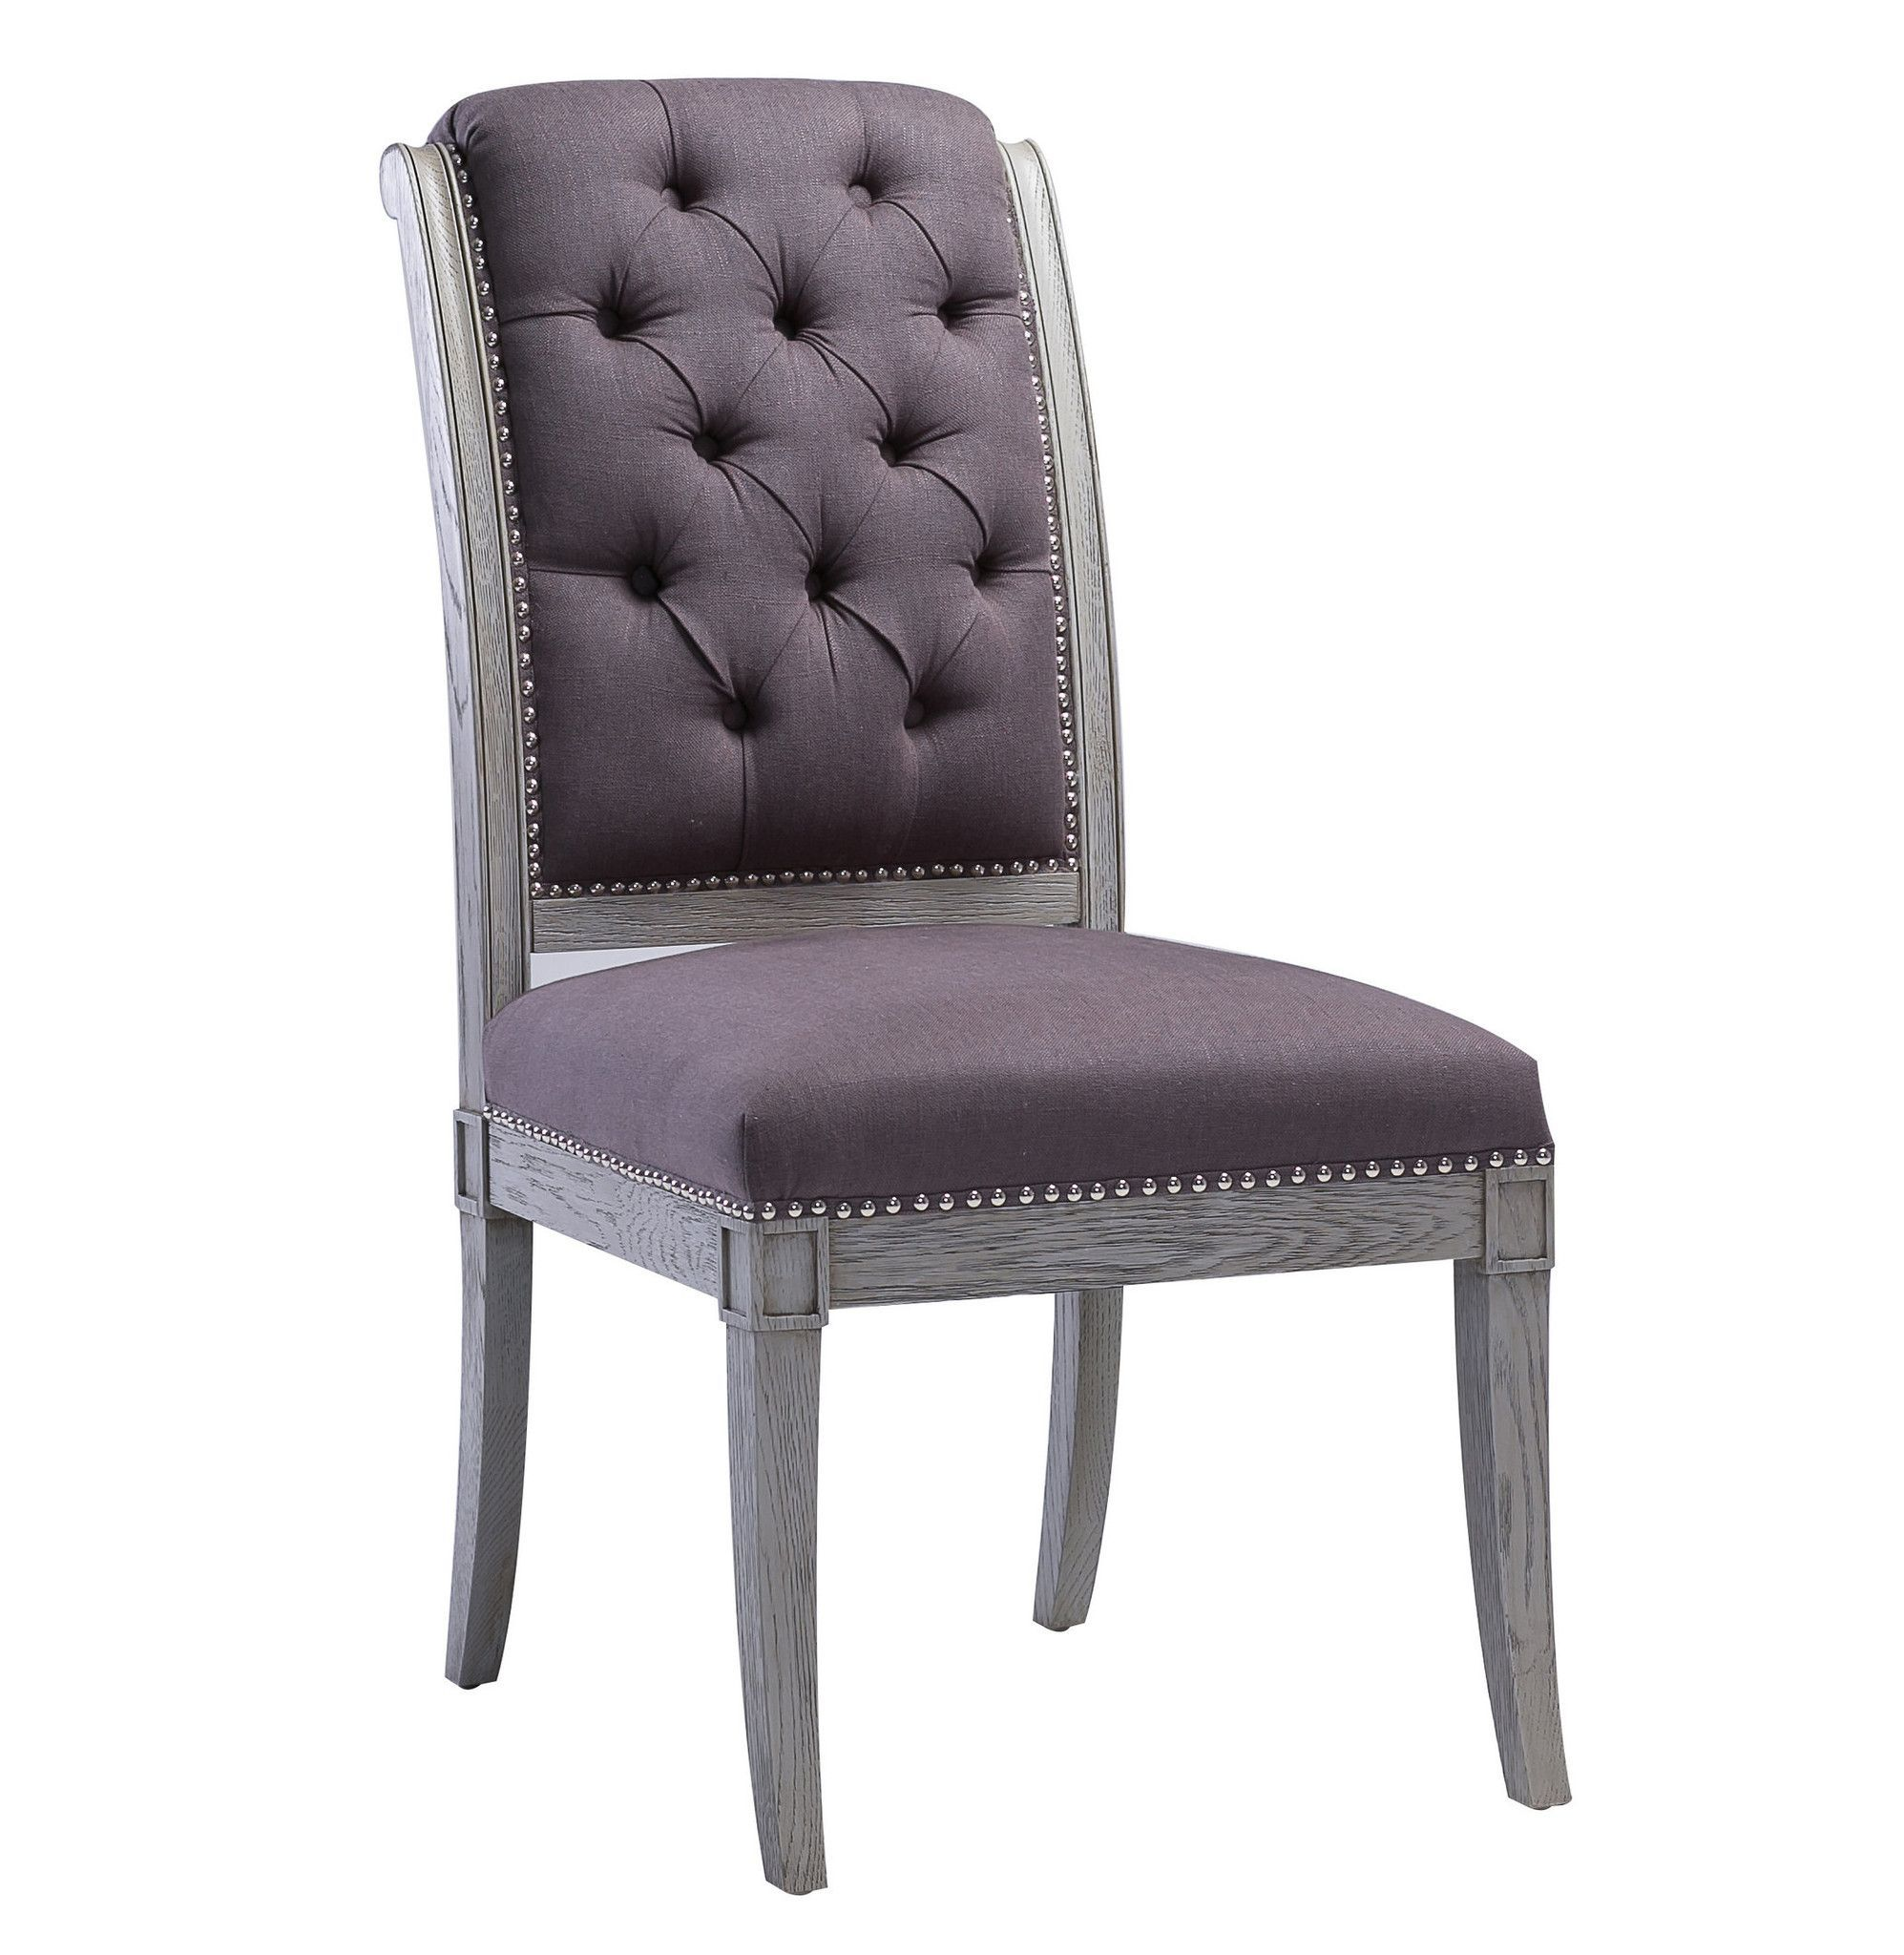 Addington Grey Linen Side Chair